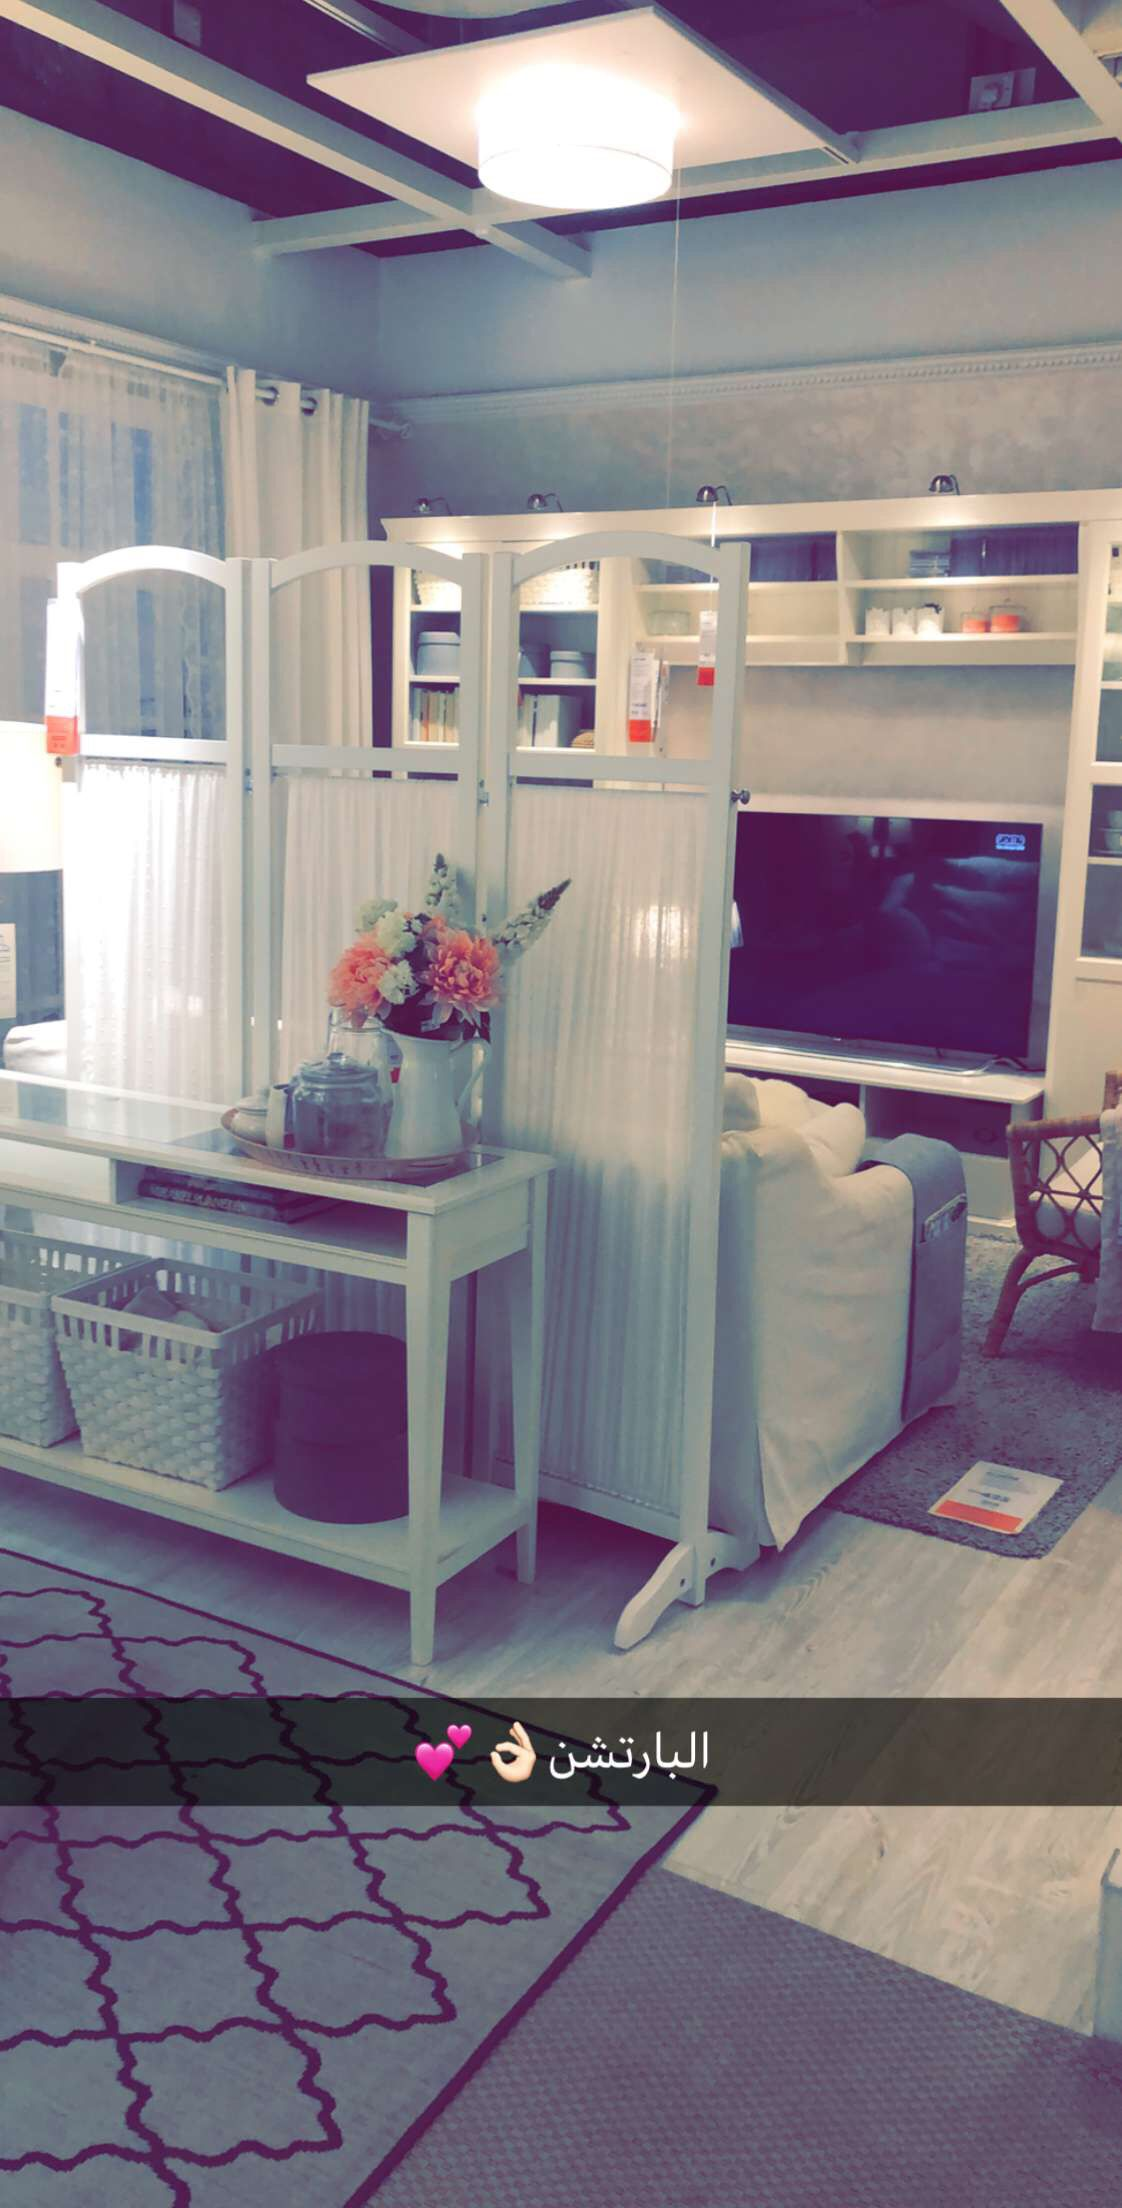 Ikea Ideas Photos Decor ديكور افكار تصويري مفضلاتي Home Decor Furniture Decor